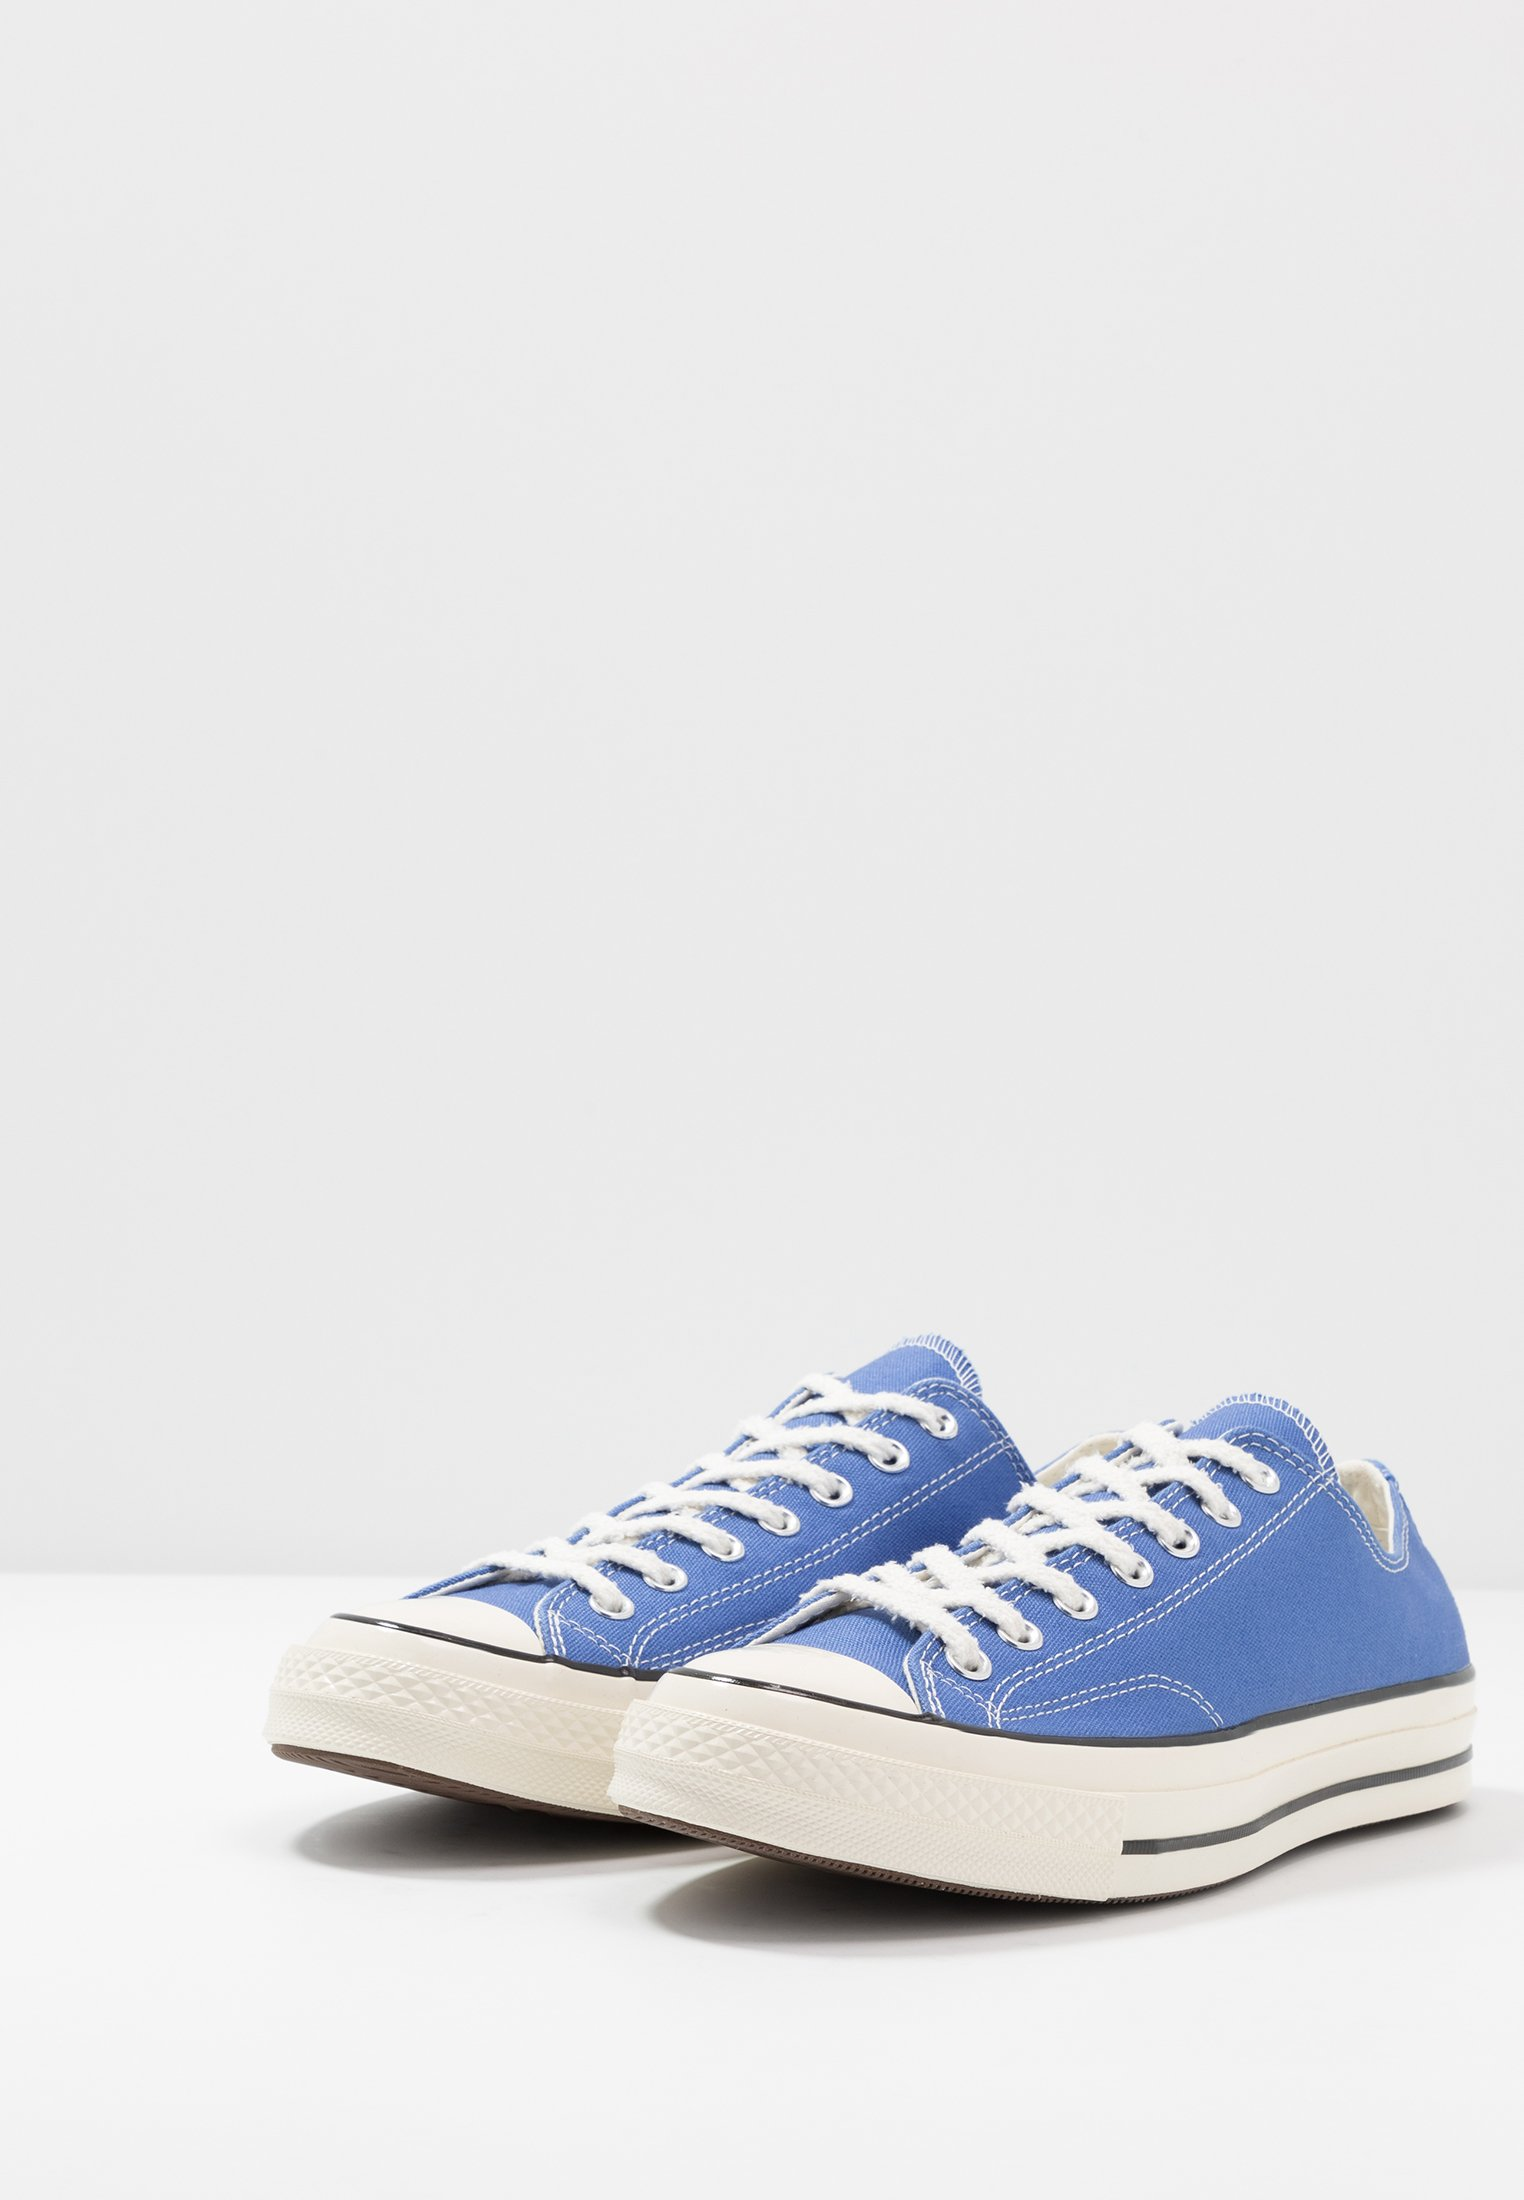 Converse CHUCK TAYLOR ALL STAR 70 - Sneaker low - ozone blue/egret/black/blau - Herrenschuhe 6jaQK